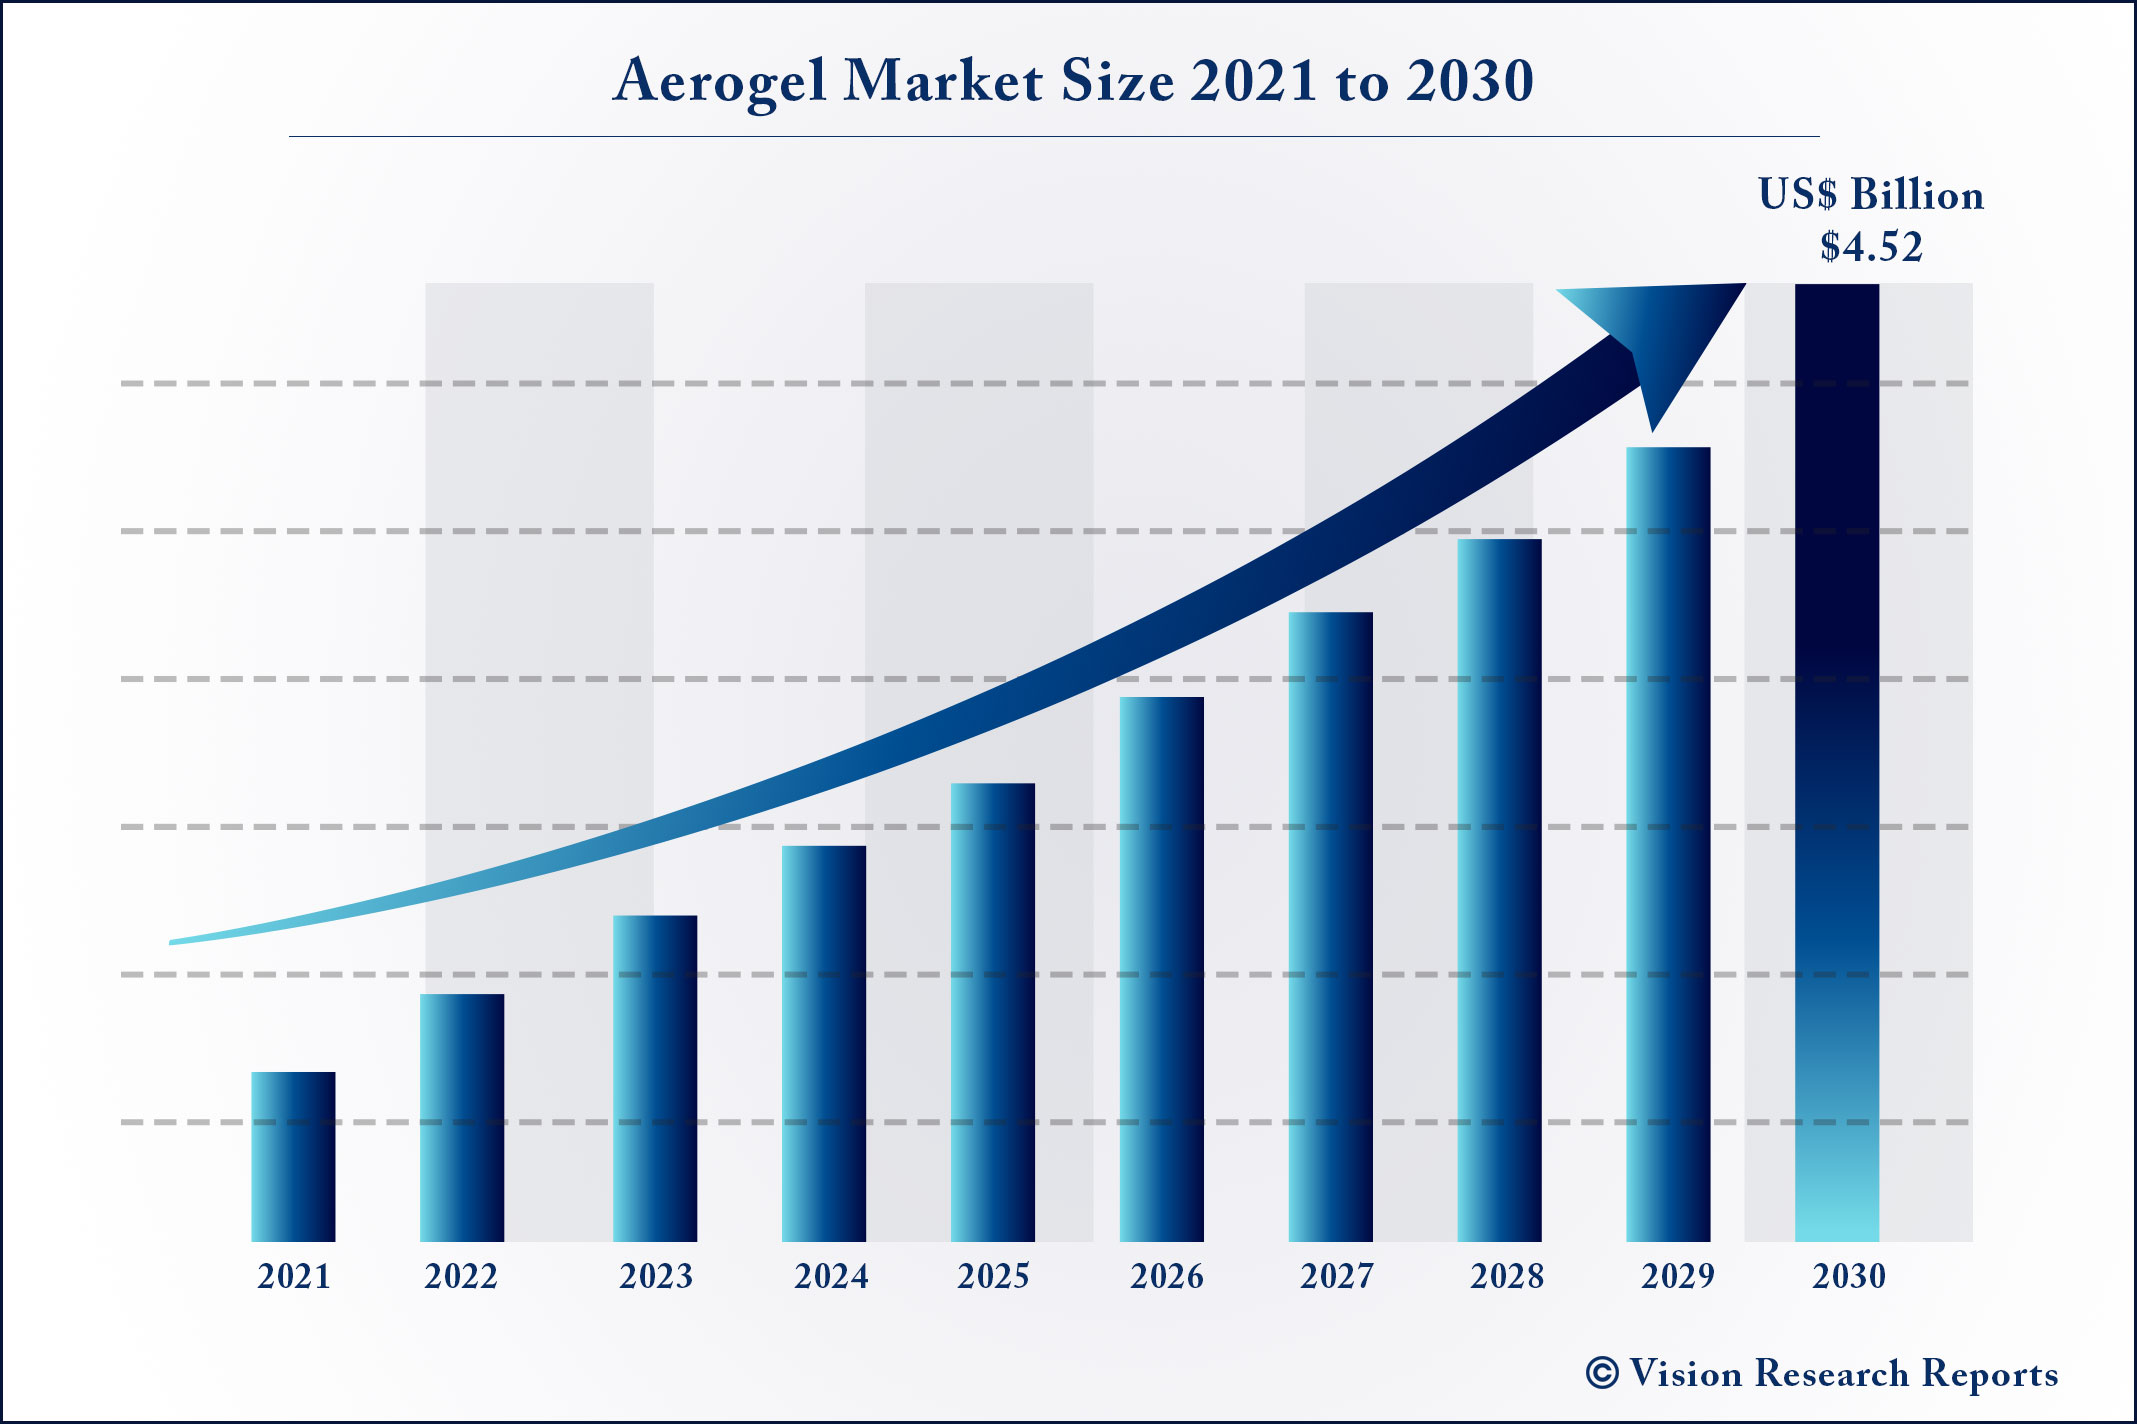 Aerogel Market Size 2021 to 2030